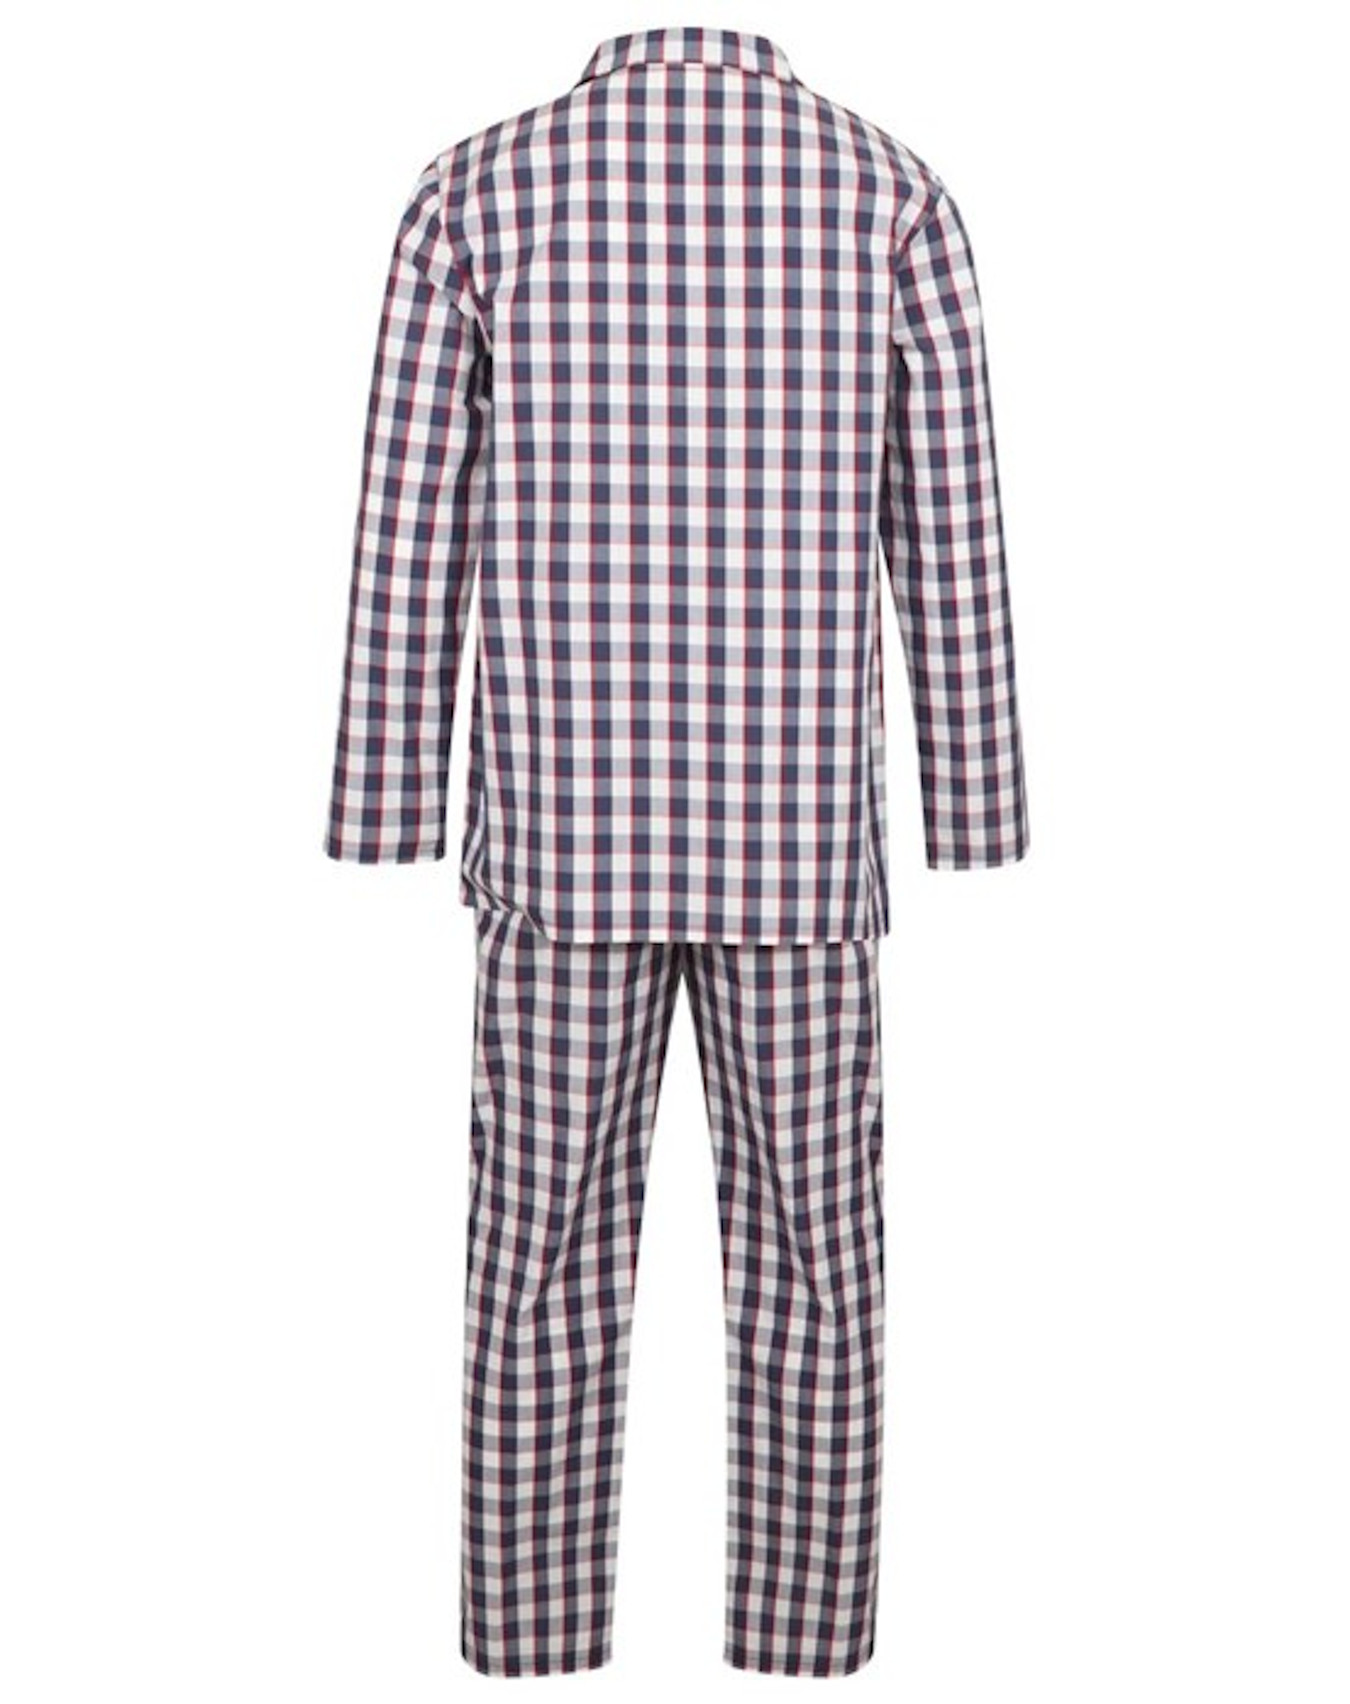 Walker Reid Mens Cotton Geo Print Tailored Pyjamas PJs Medium-3XL Blue or Red